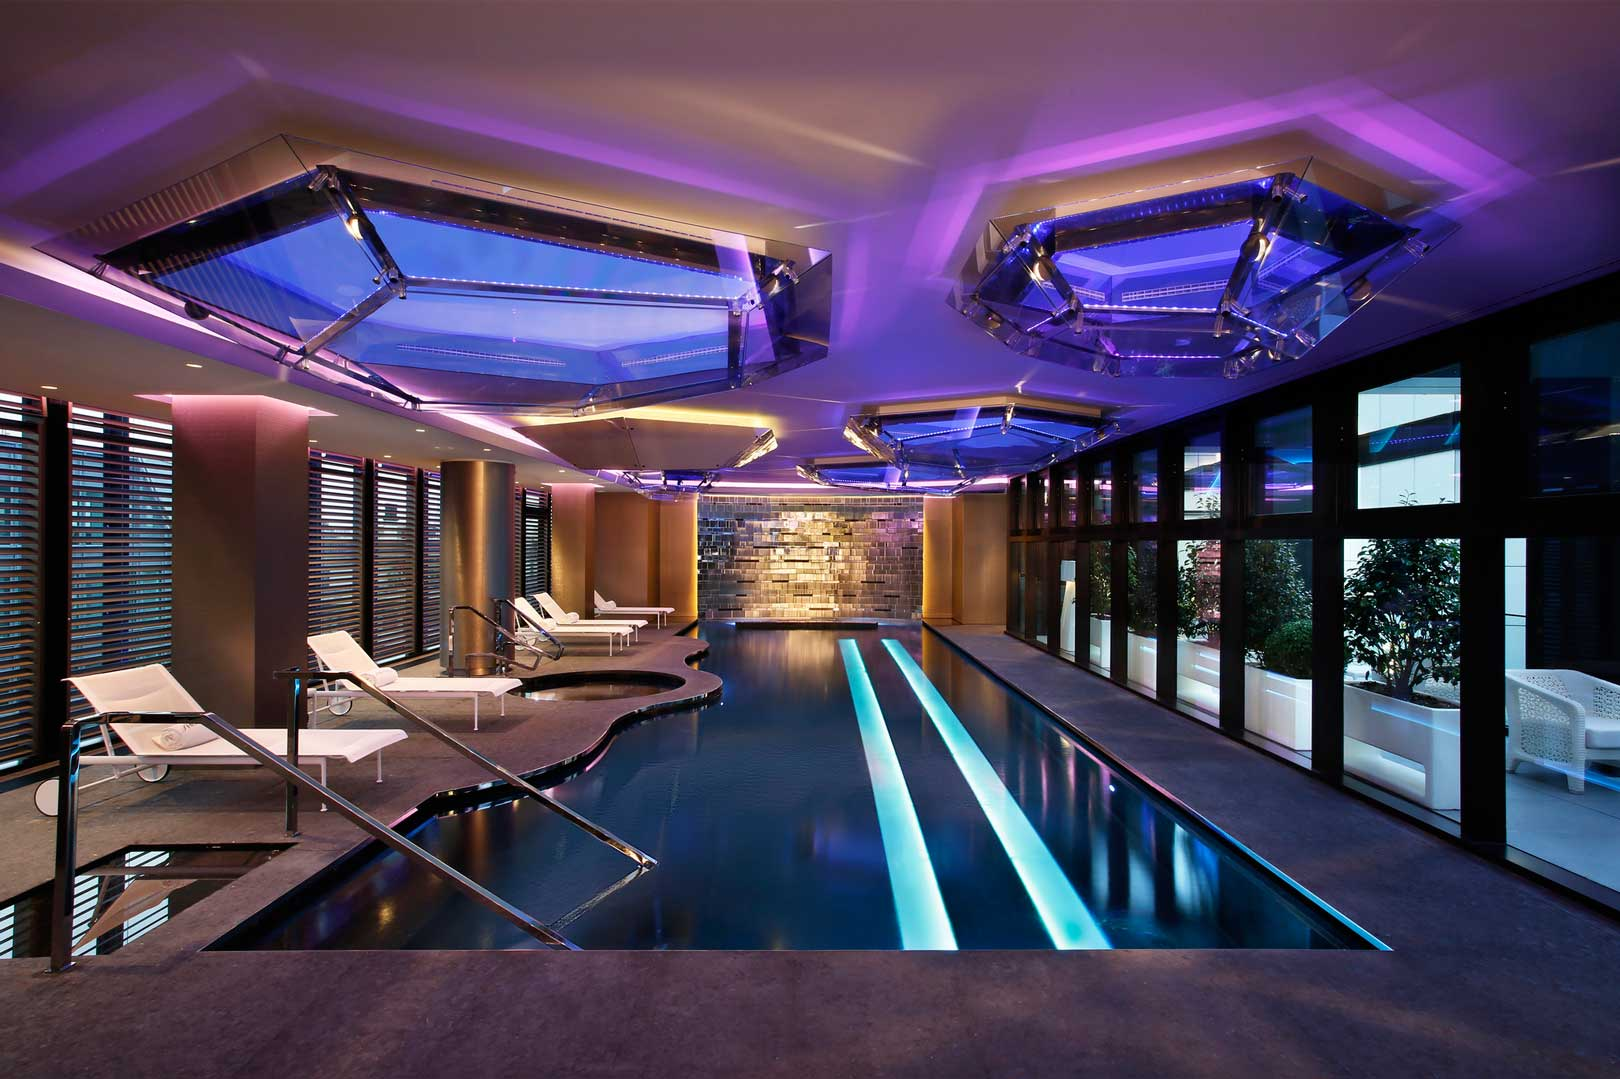 Excelsior Hotel Gallia | Shiseido Spa